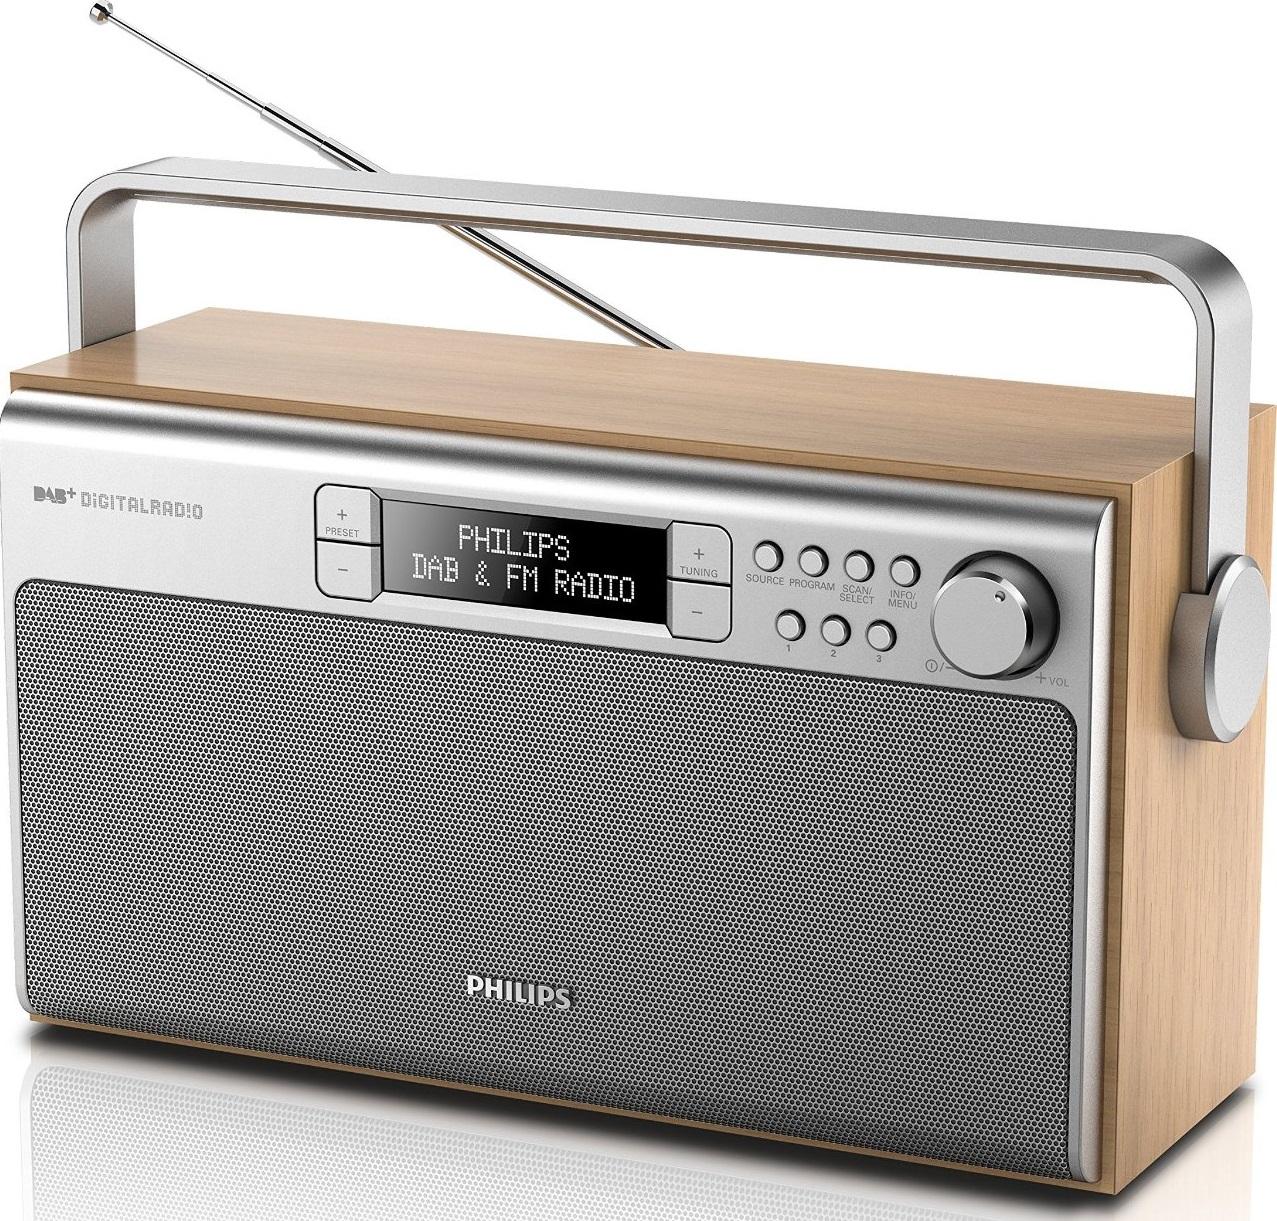 philips ae5220 05 portable radio with dab fm digital. Black Bedroom Furniture Sets. Home Design Ideas